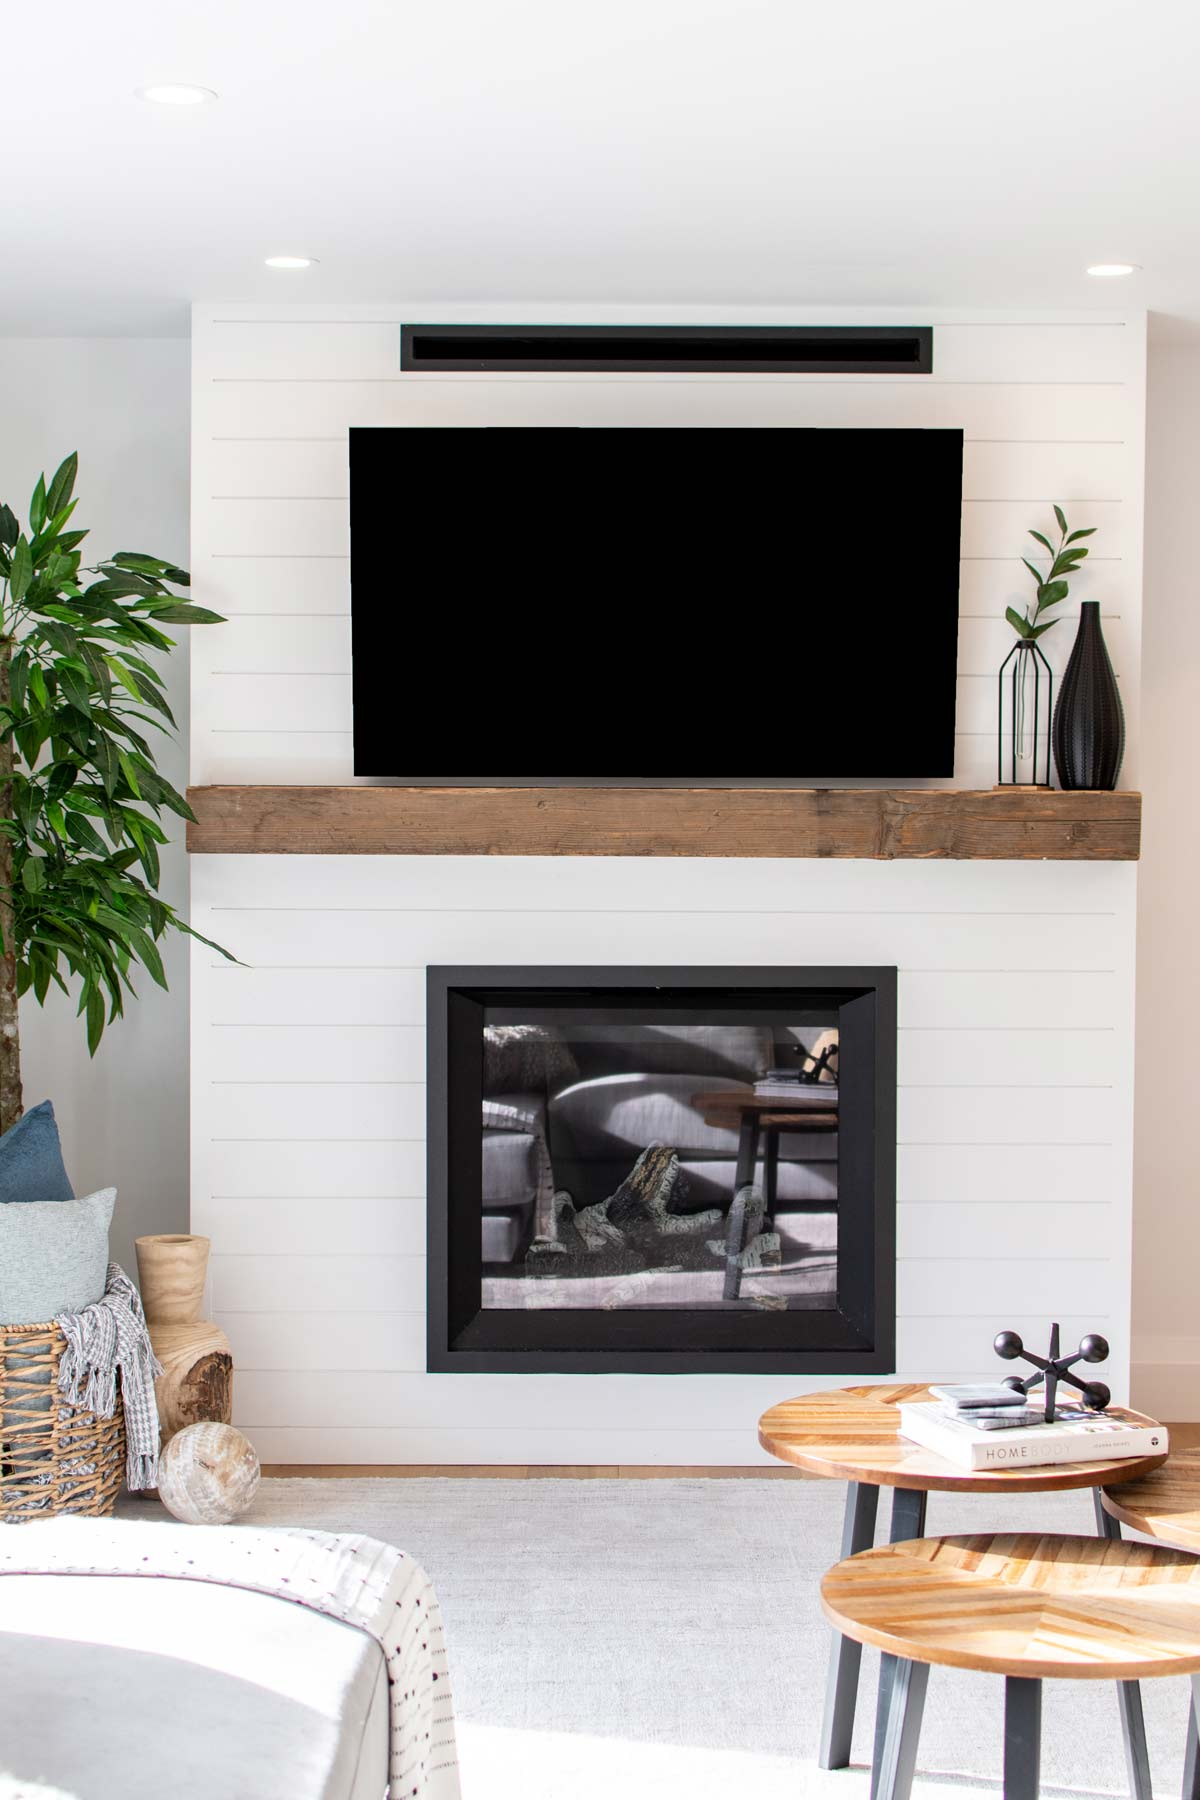 modern-edgy-design-interior-tv-fireplace